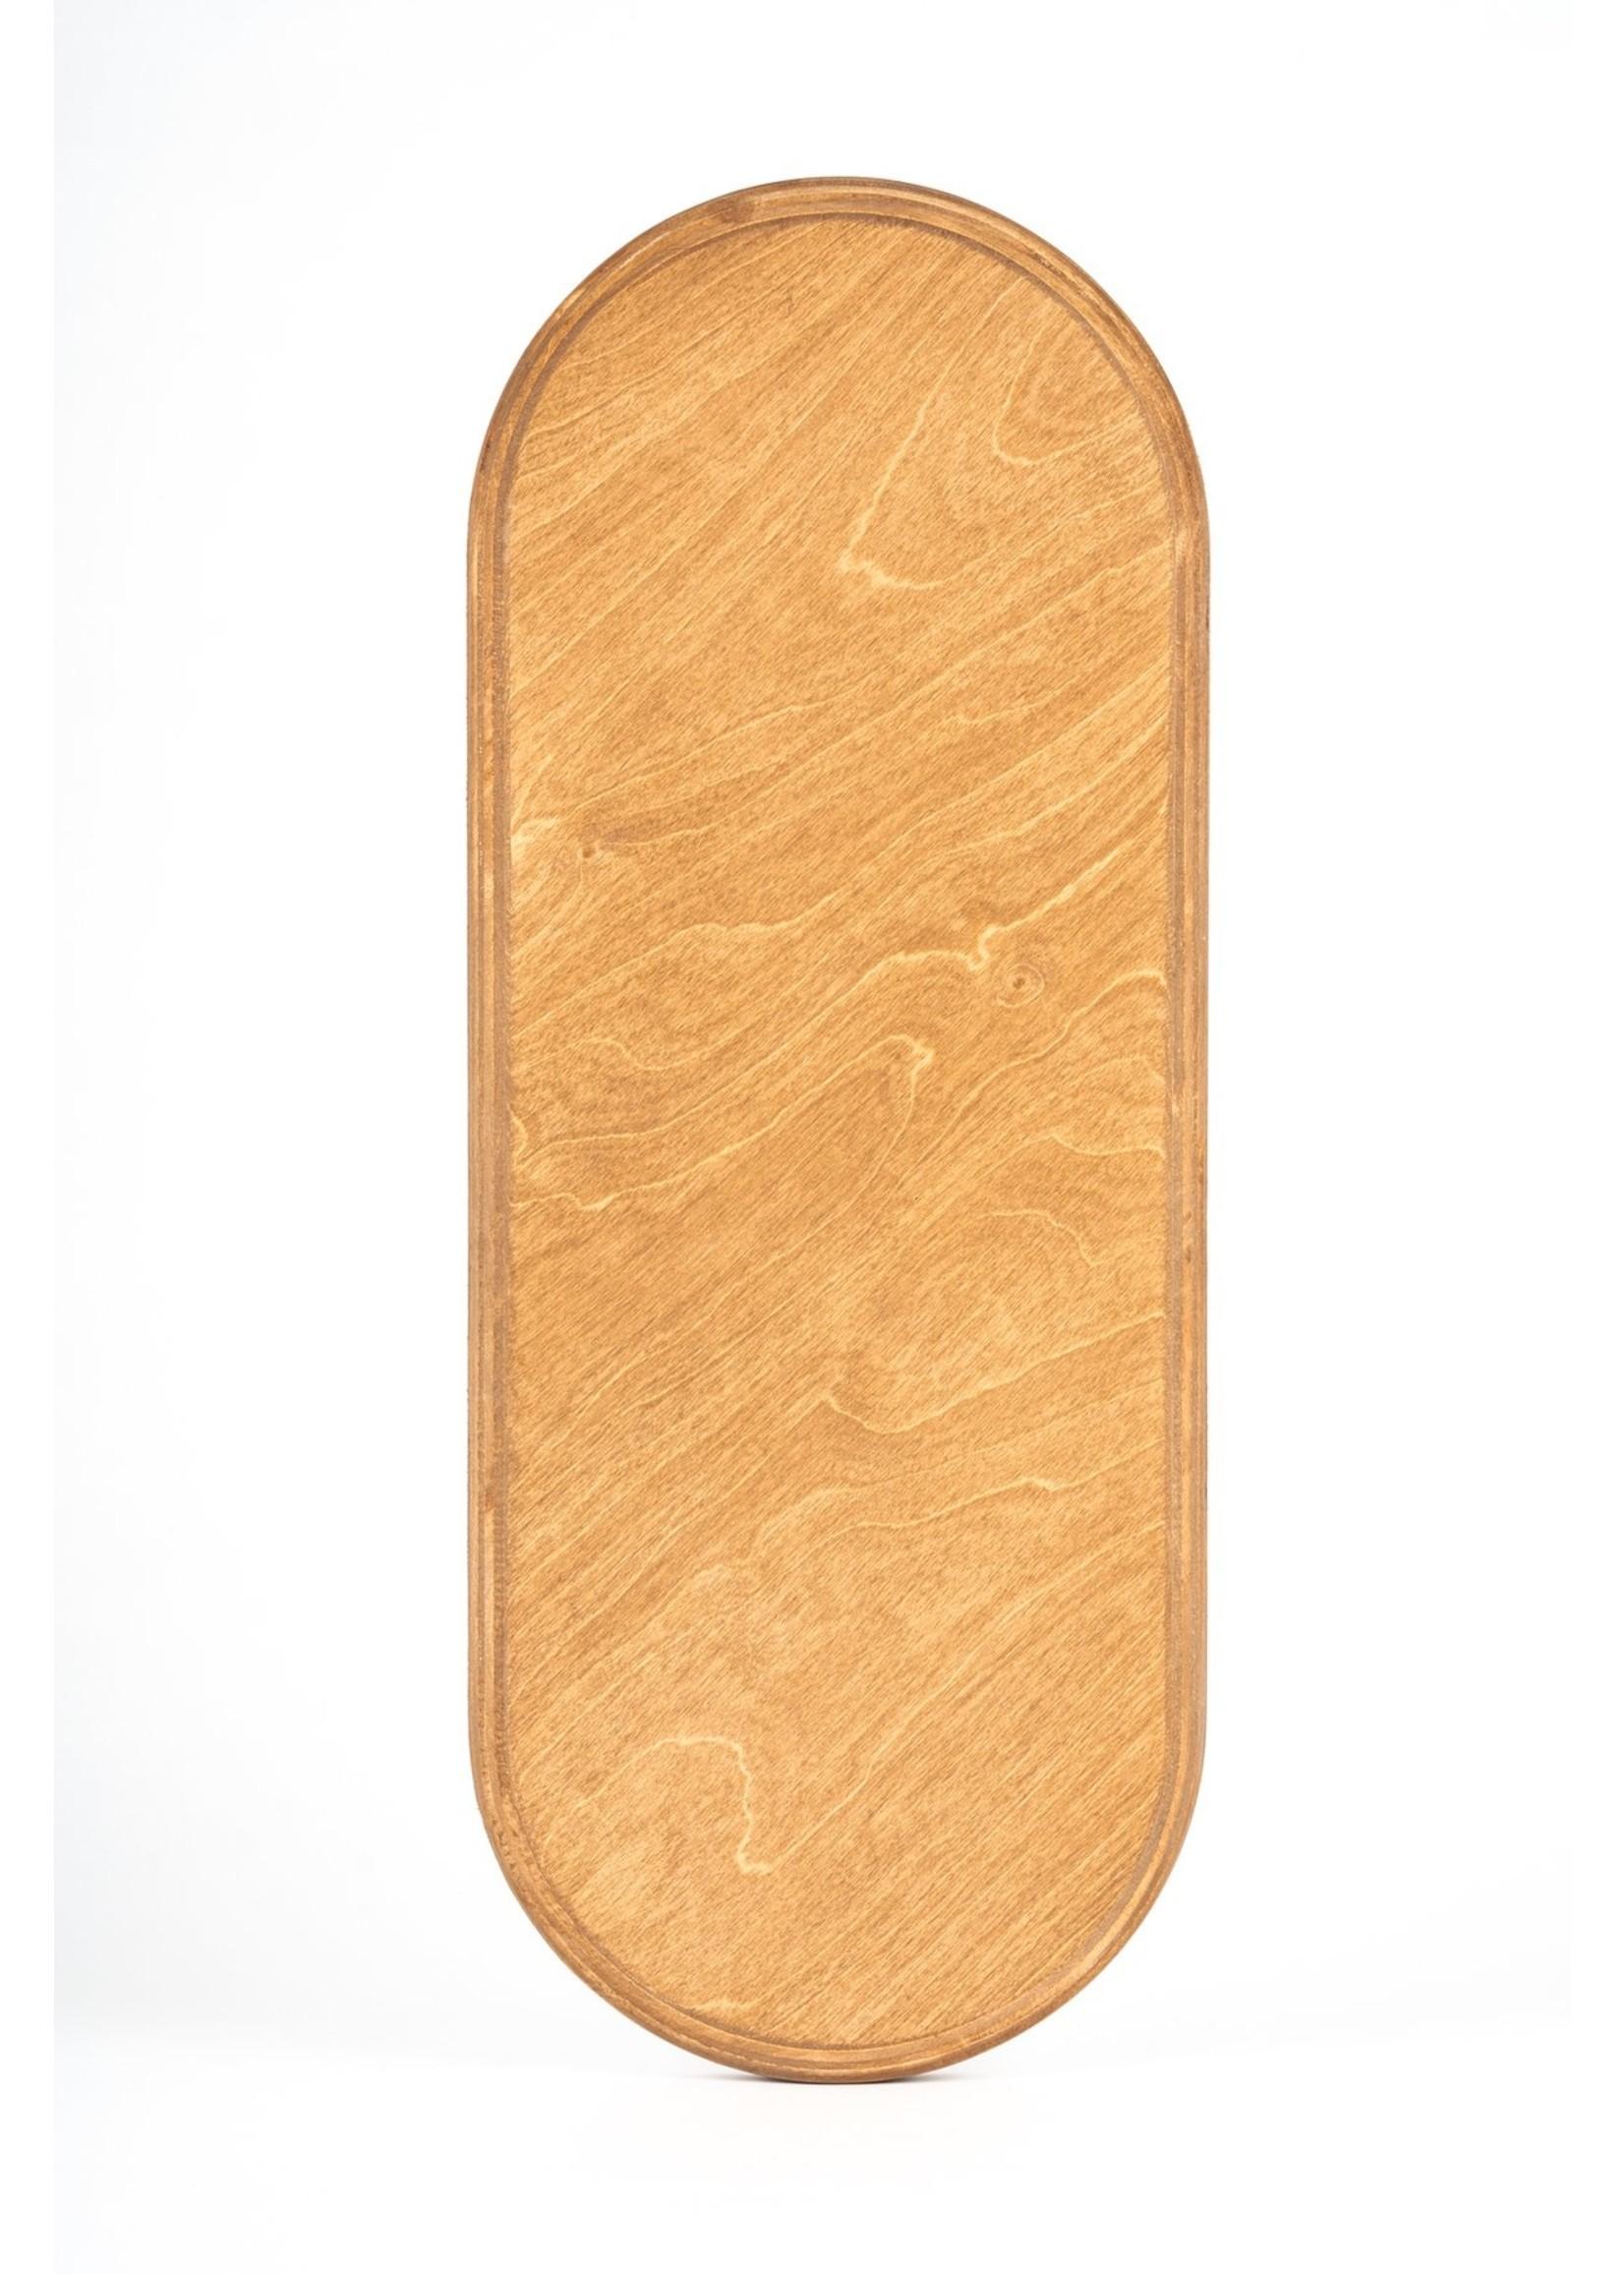 Montreal B-Board CLASSIC SHAPE